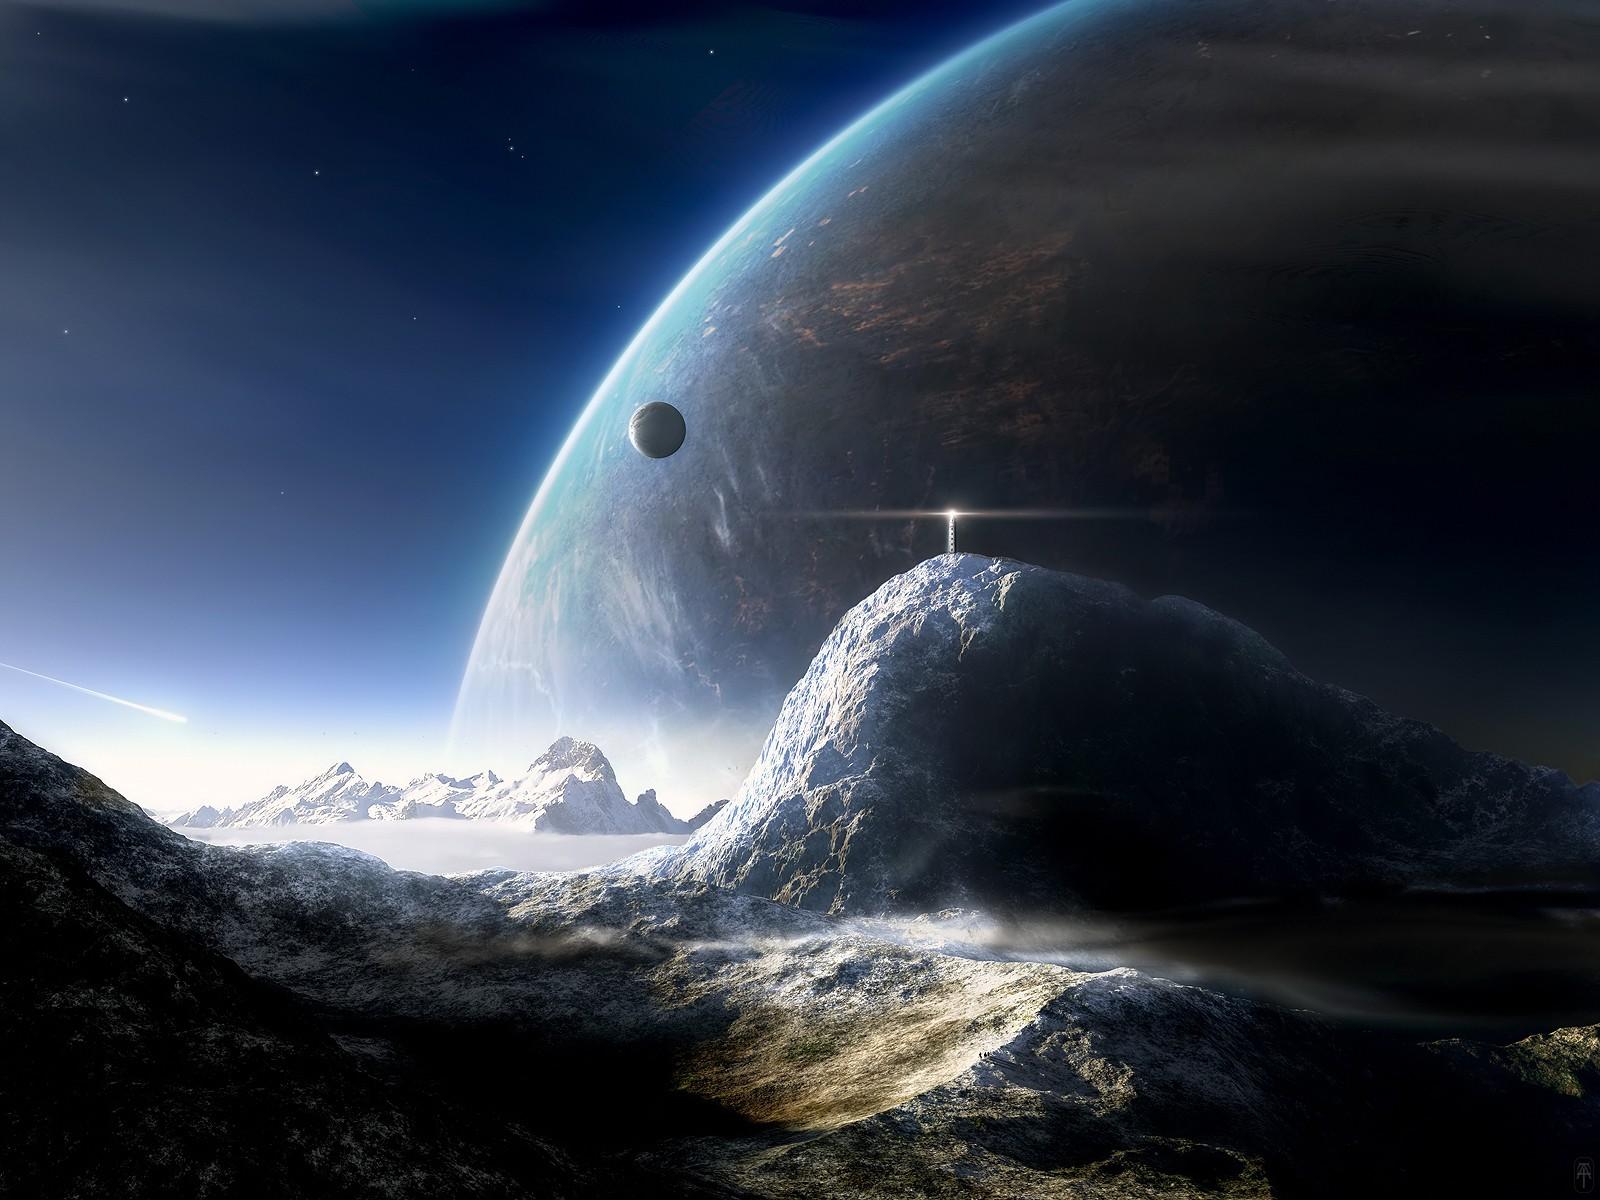 Wallpaper Planit Ruang Bumi Sinar Bulan Suasana Atmosfer Bumi Luar Angkasa Obyek Astronomi 1600x1200 Rostock 193592 Hd Wallpapers Wallhere